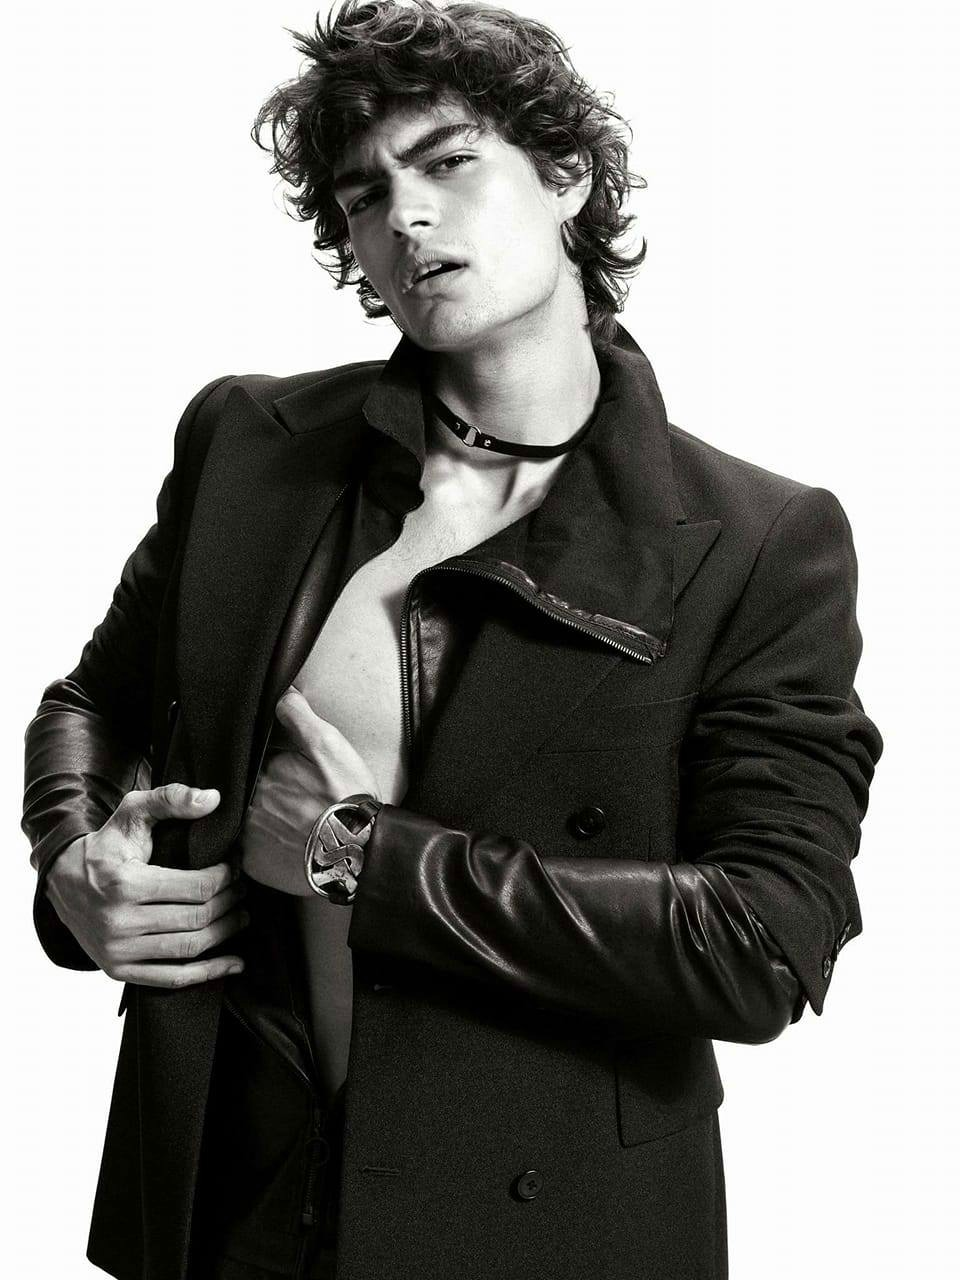 Iago Botelho by Maurizio Montani for Brazilian Male Model